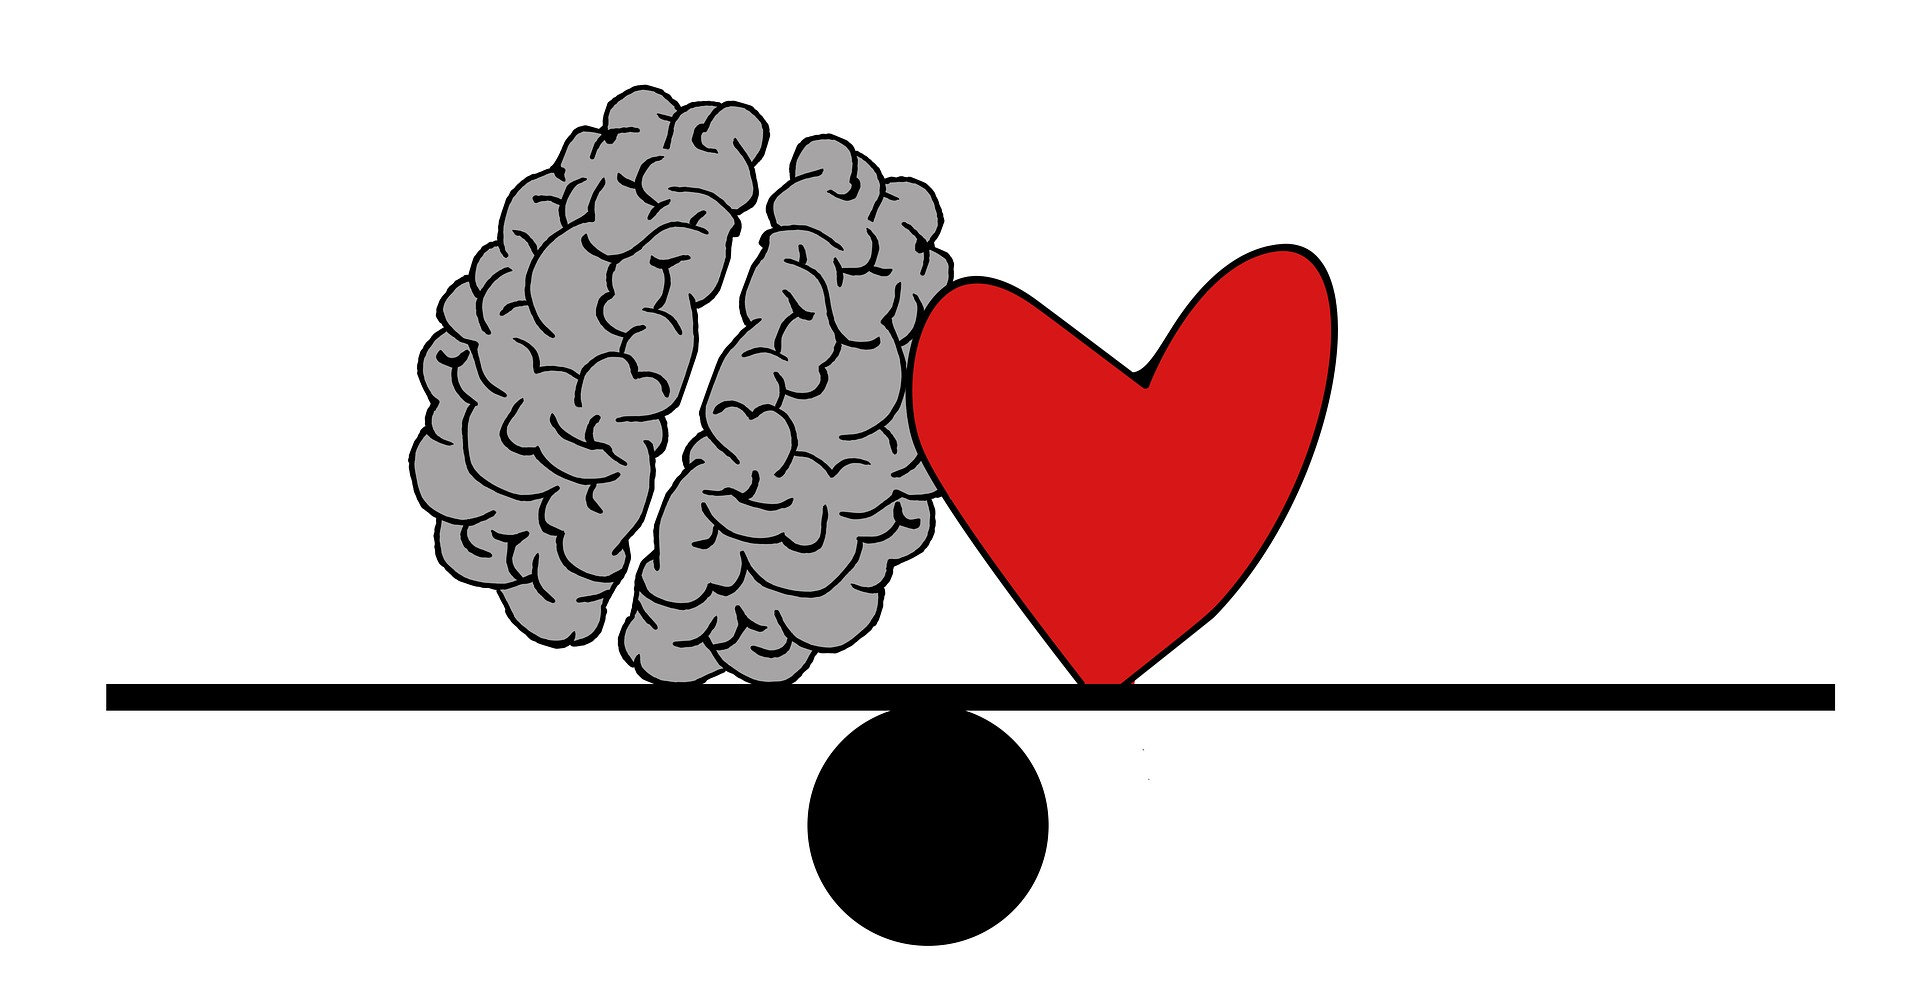 brain-2146157_1920